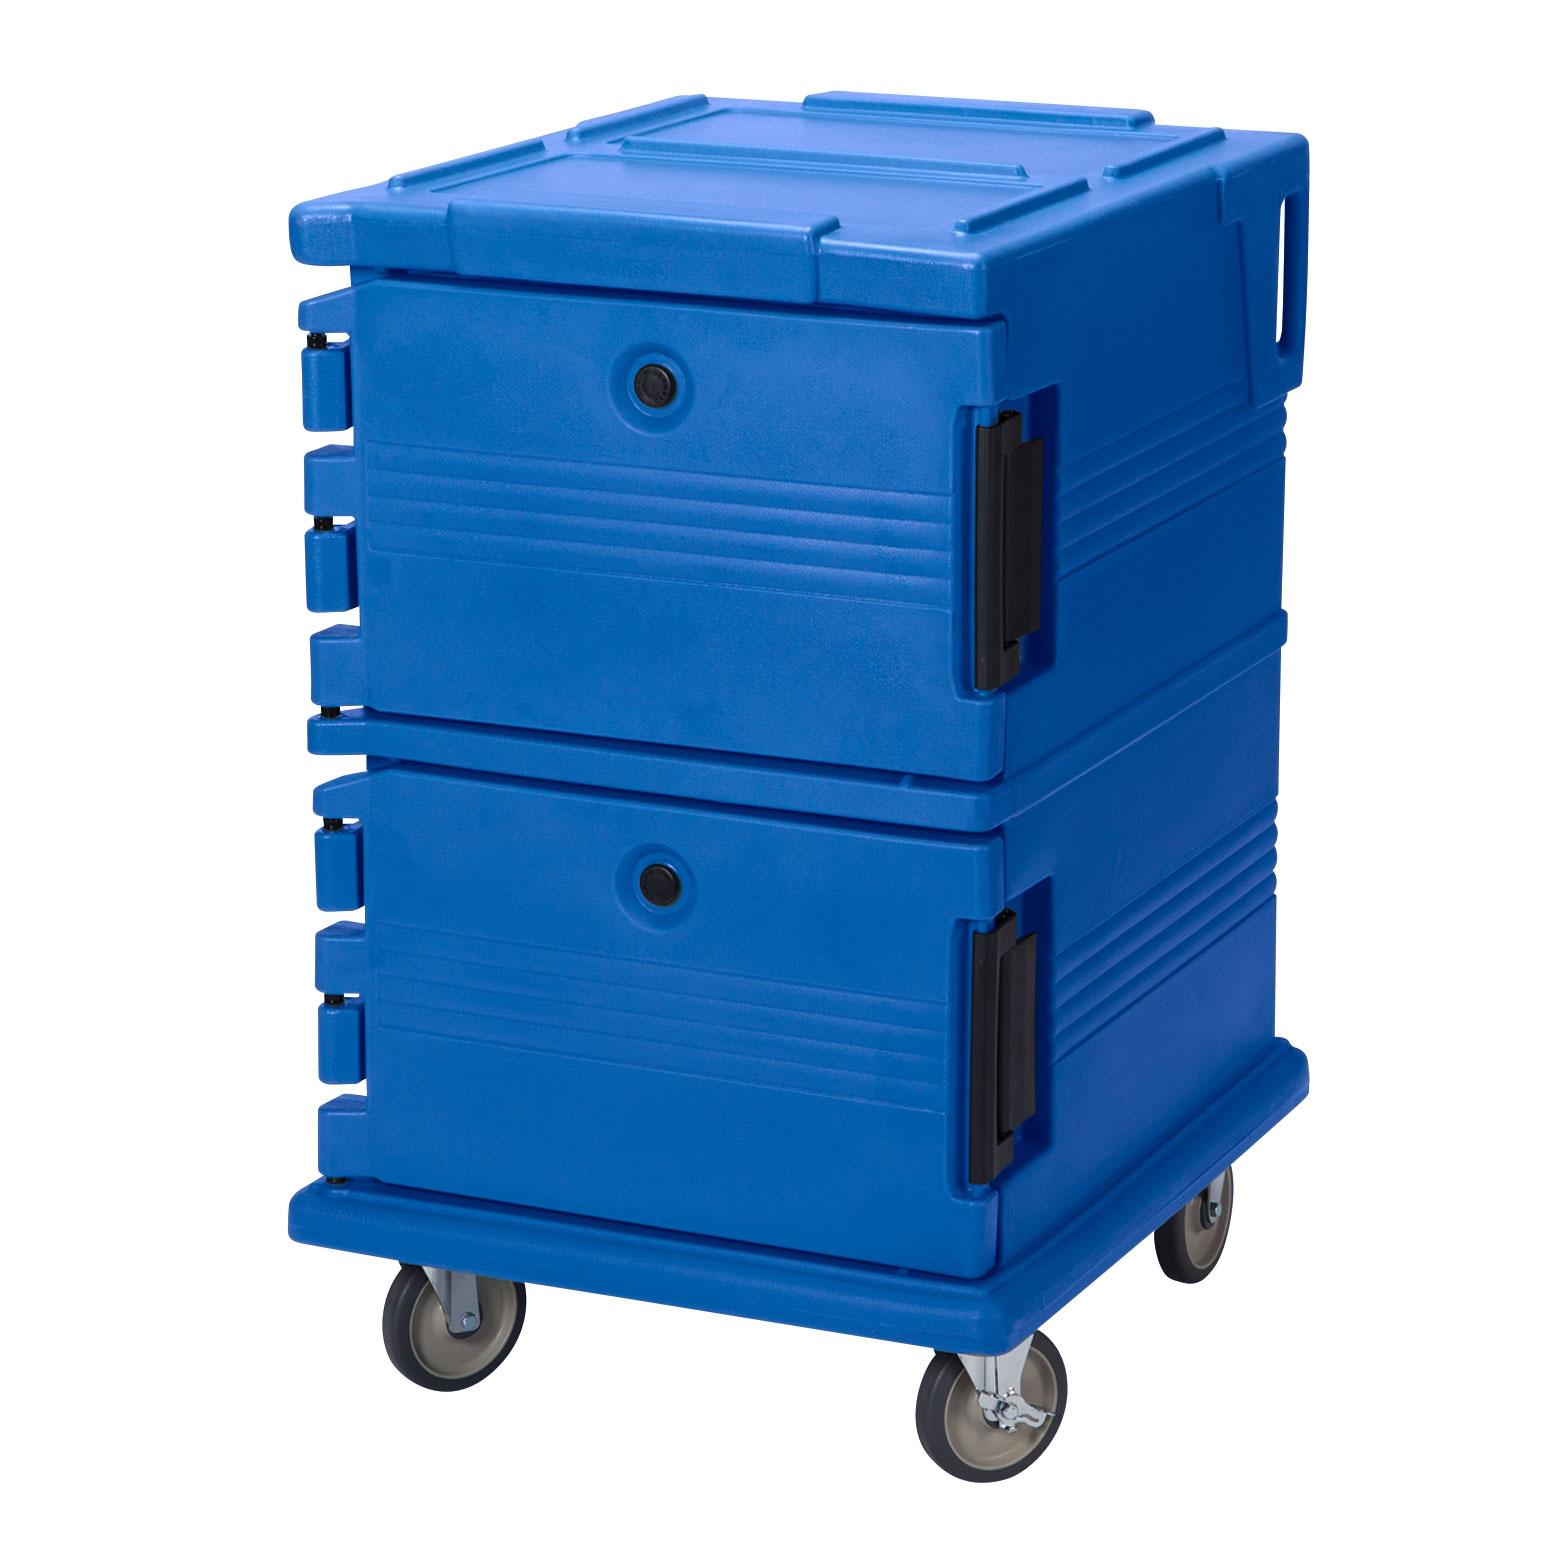 Cambro UPC1200186 insulated food storage